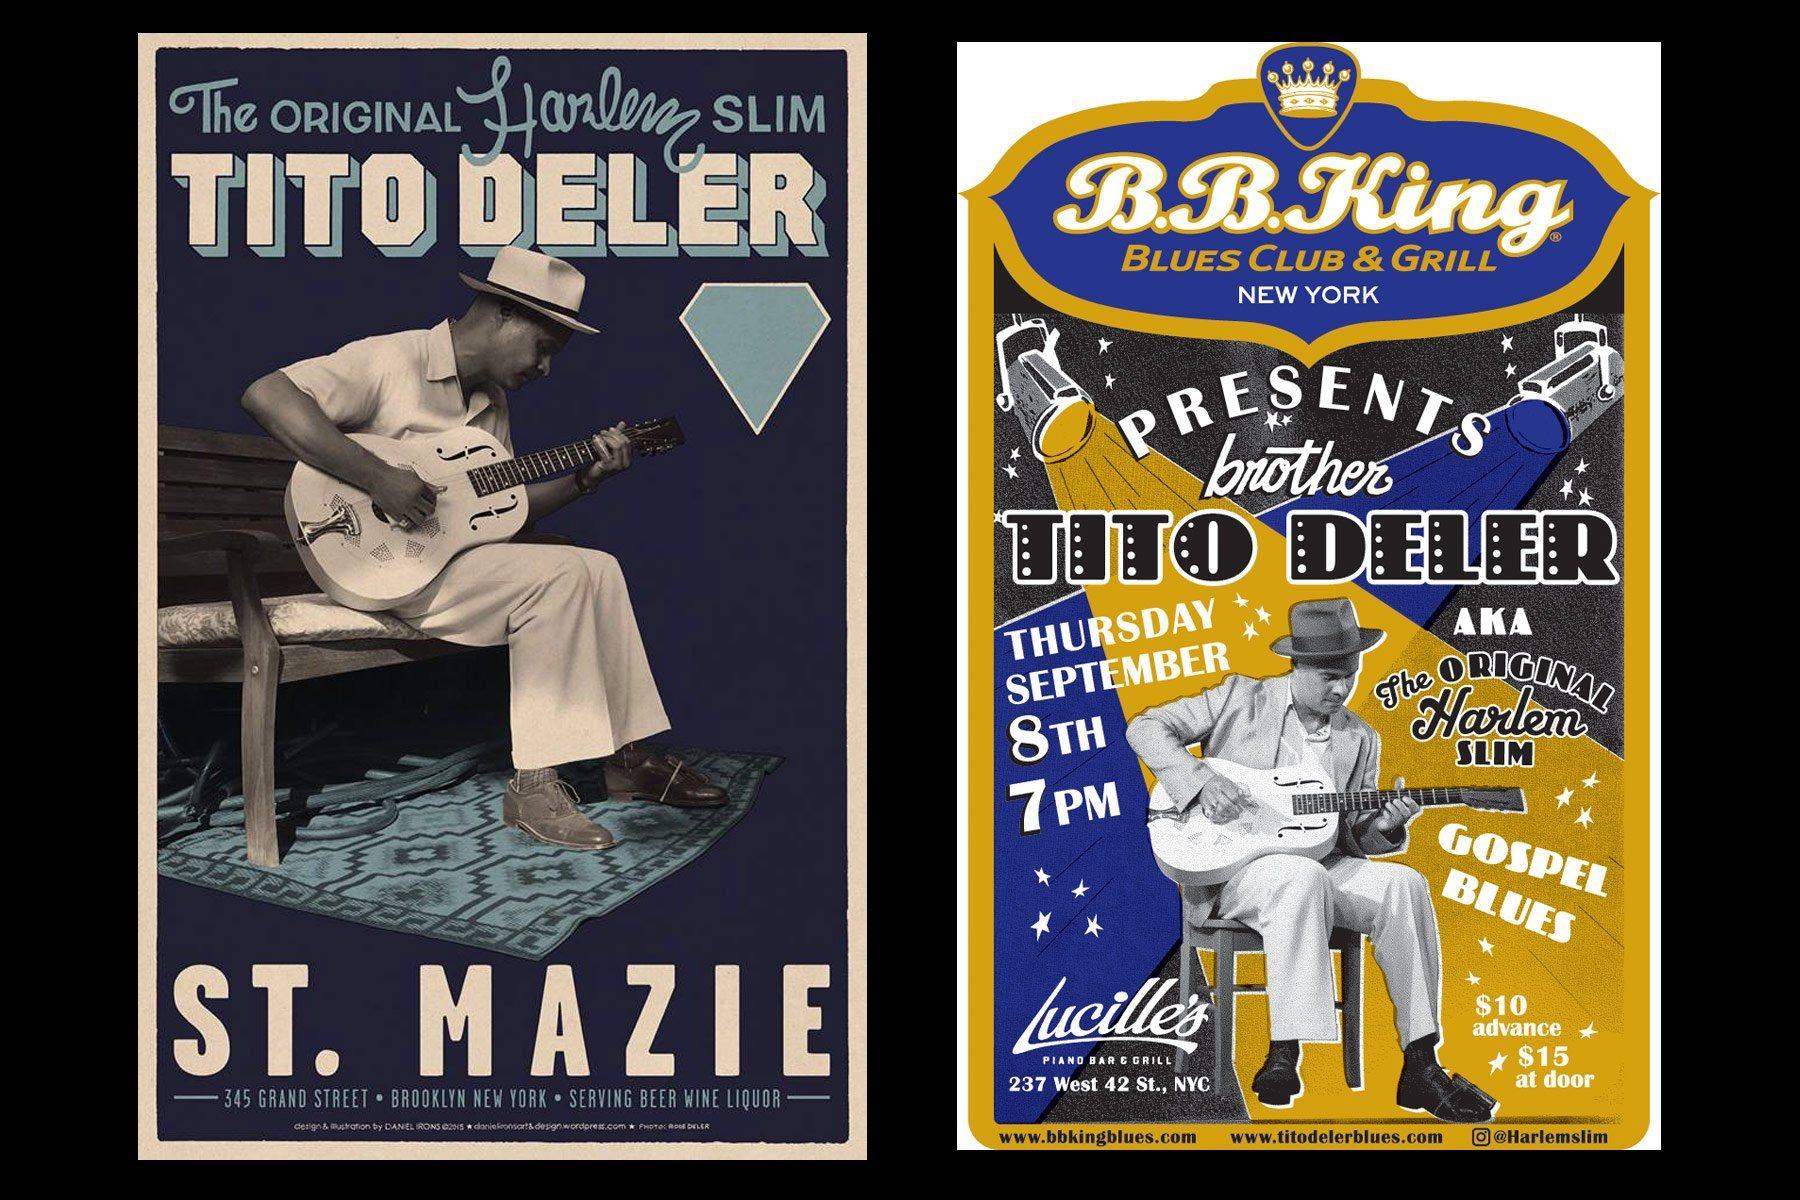 Flyers for musician Tito Deler, The Original Harlem Slim. Ponyboy magazine NY.